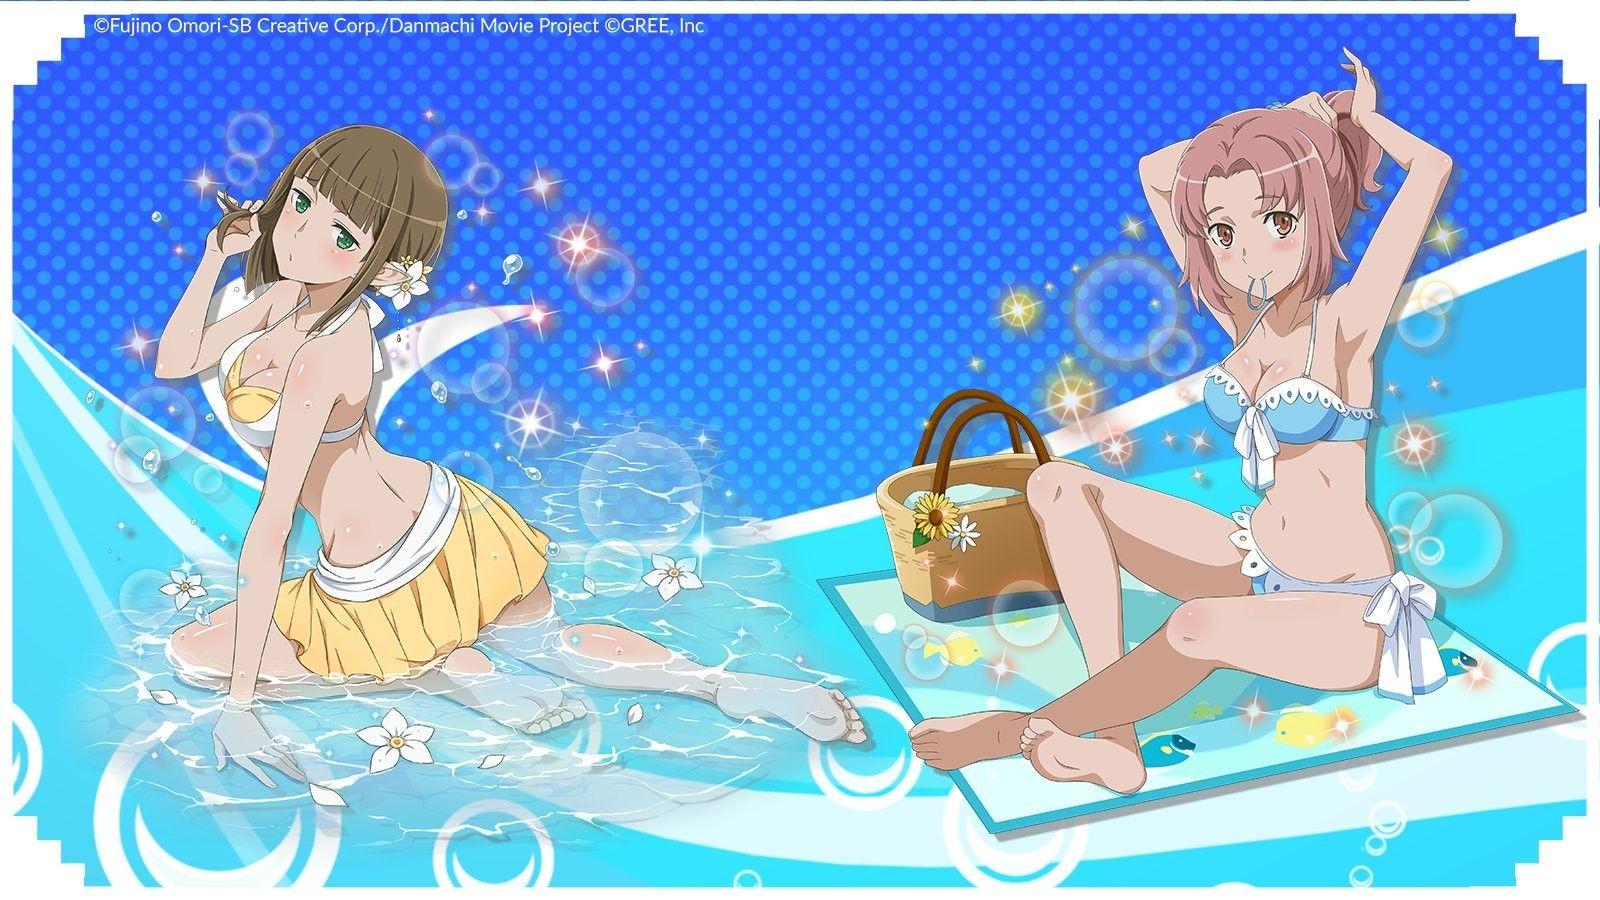 Eina Tulle & Misha Flott #Danmachi #Crunchyroll #games